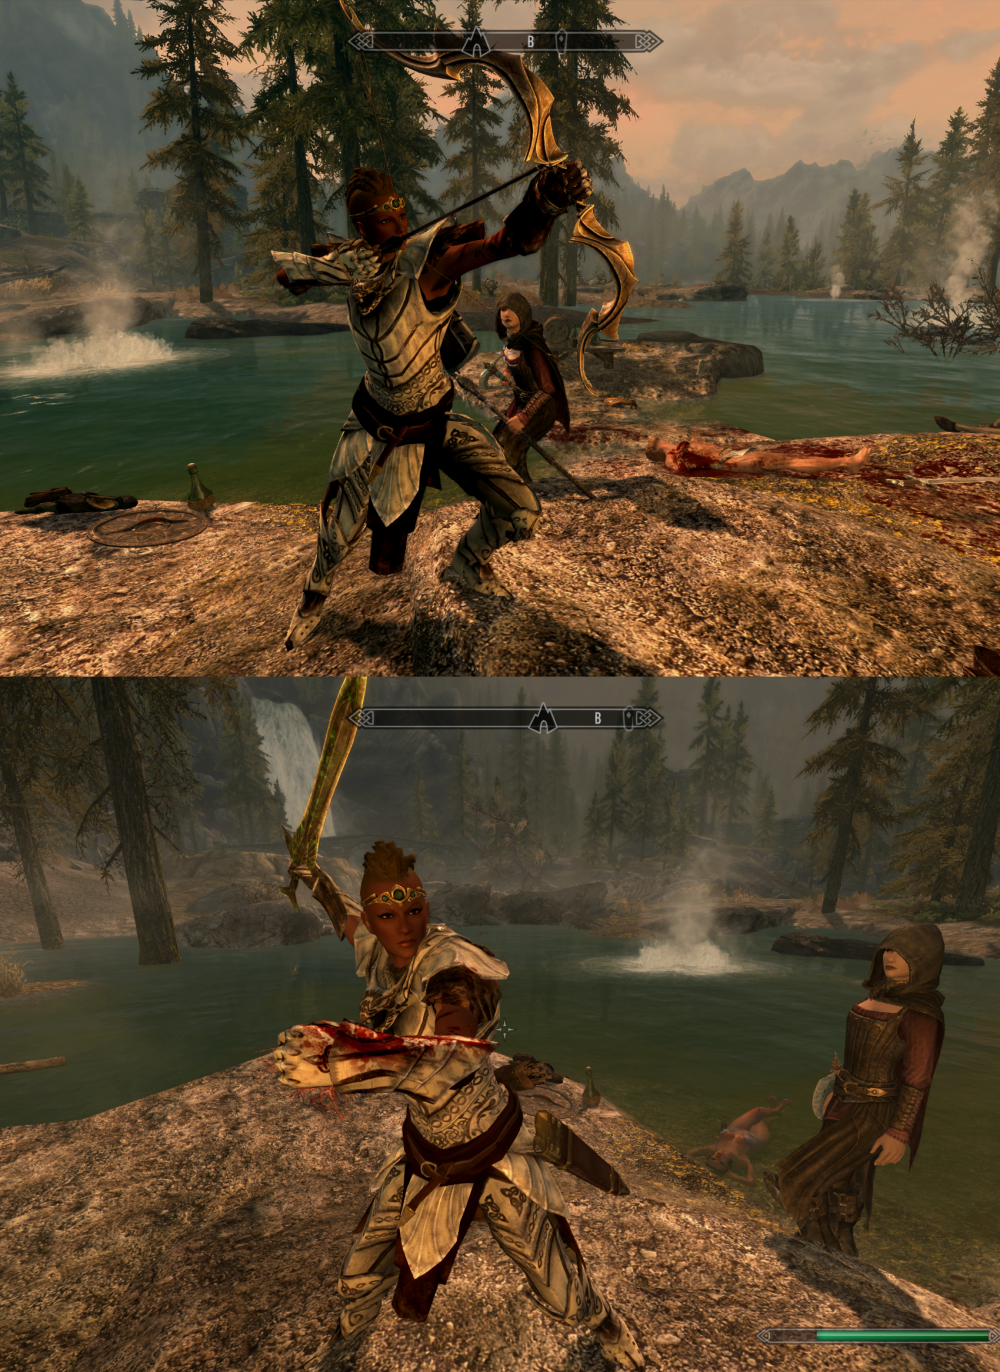 6666.png - Elder Scrolls 5: Skyrim, the